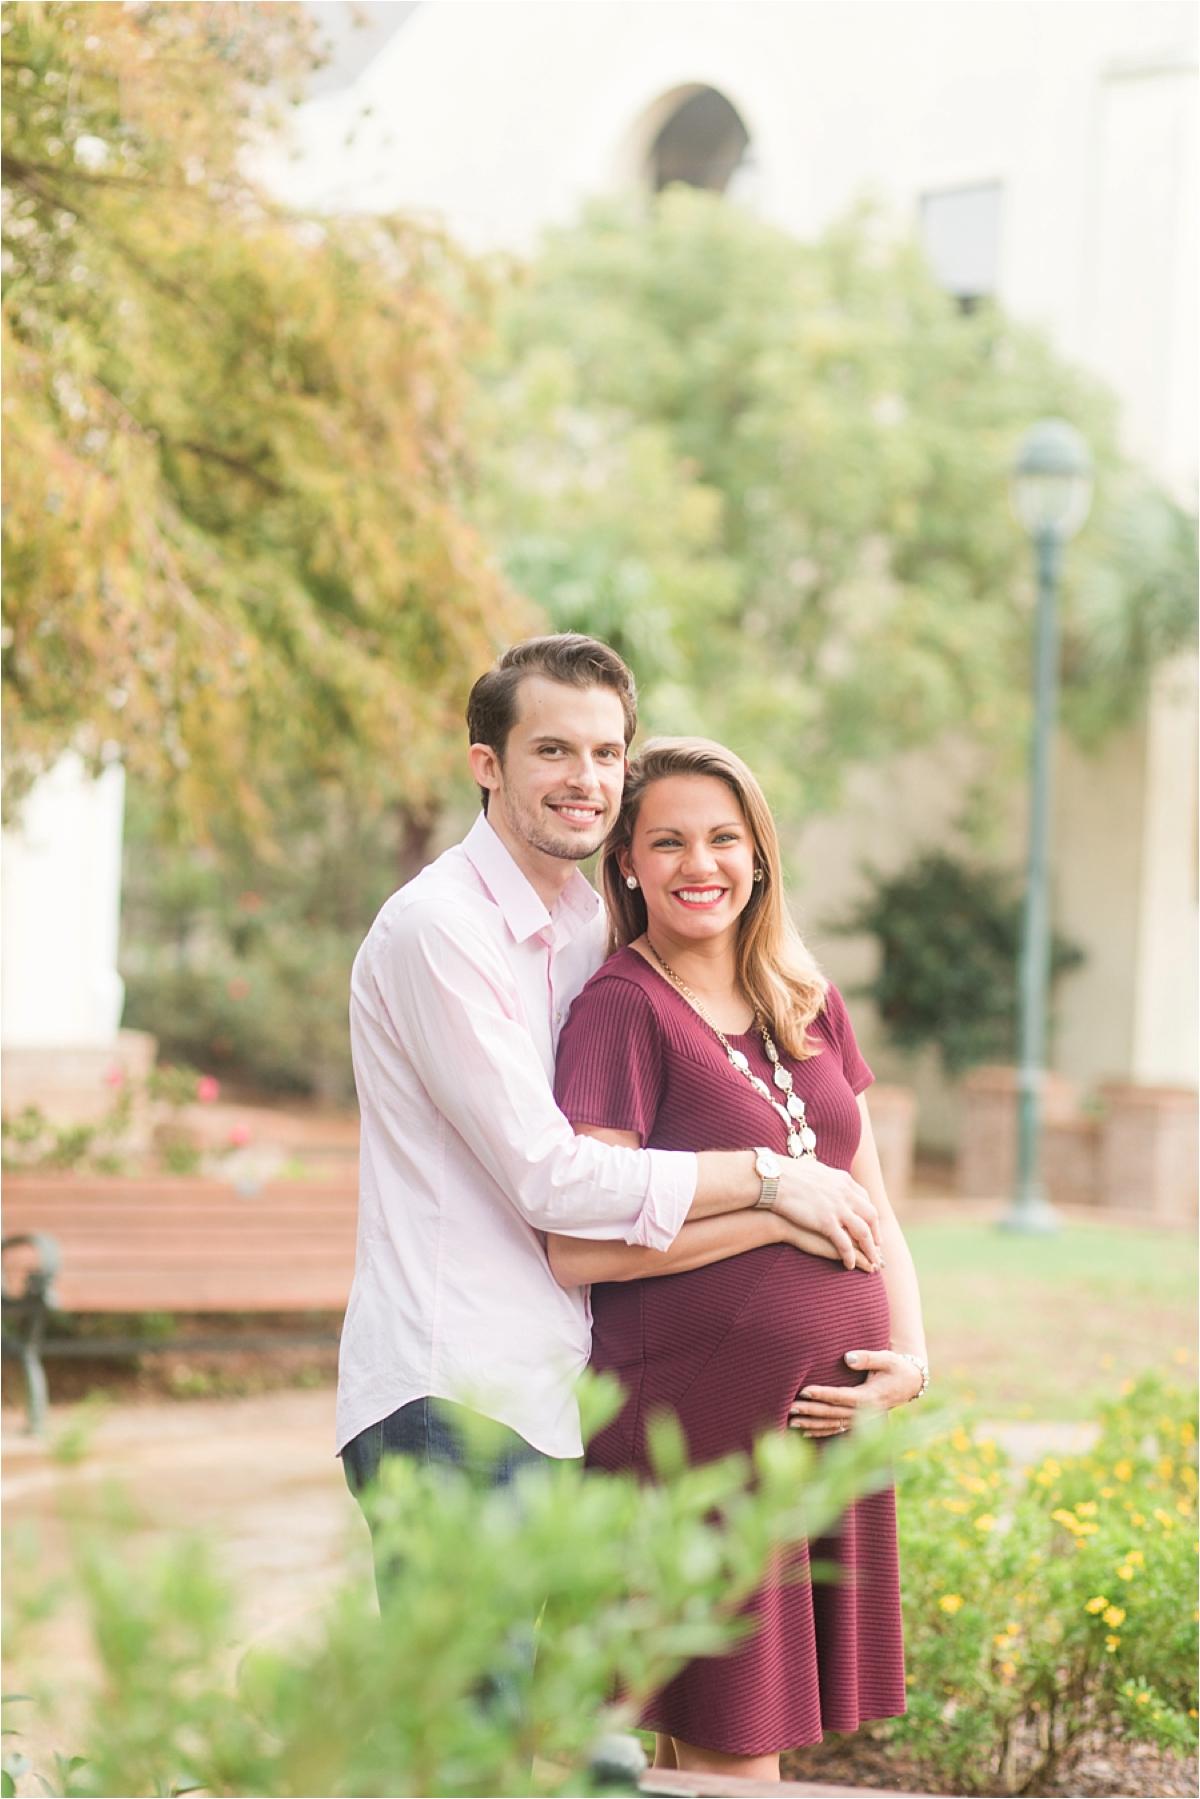 Mobile Alabama Maternity Session-Magan + Kyle-Maternity Photoshoot-Fall couple shoot-Autumn couple shoot-Alabama photographer